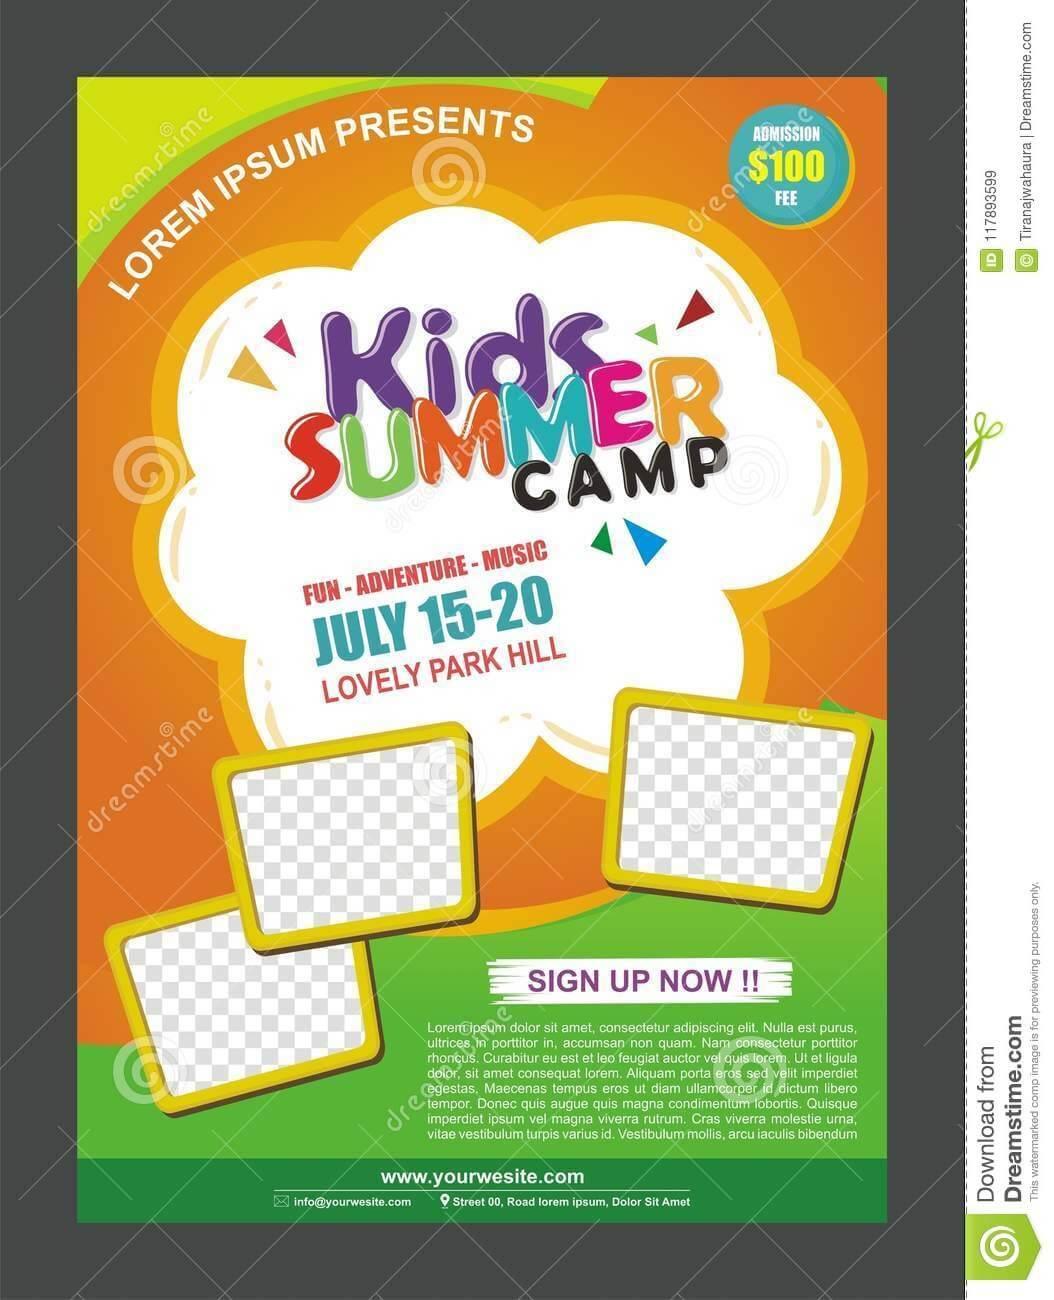 Kids Summer Camp Banner Poster Design Template For Kids In Summer Camp Brochure Template Free Download